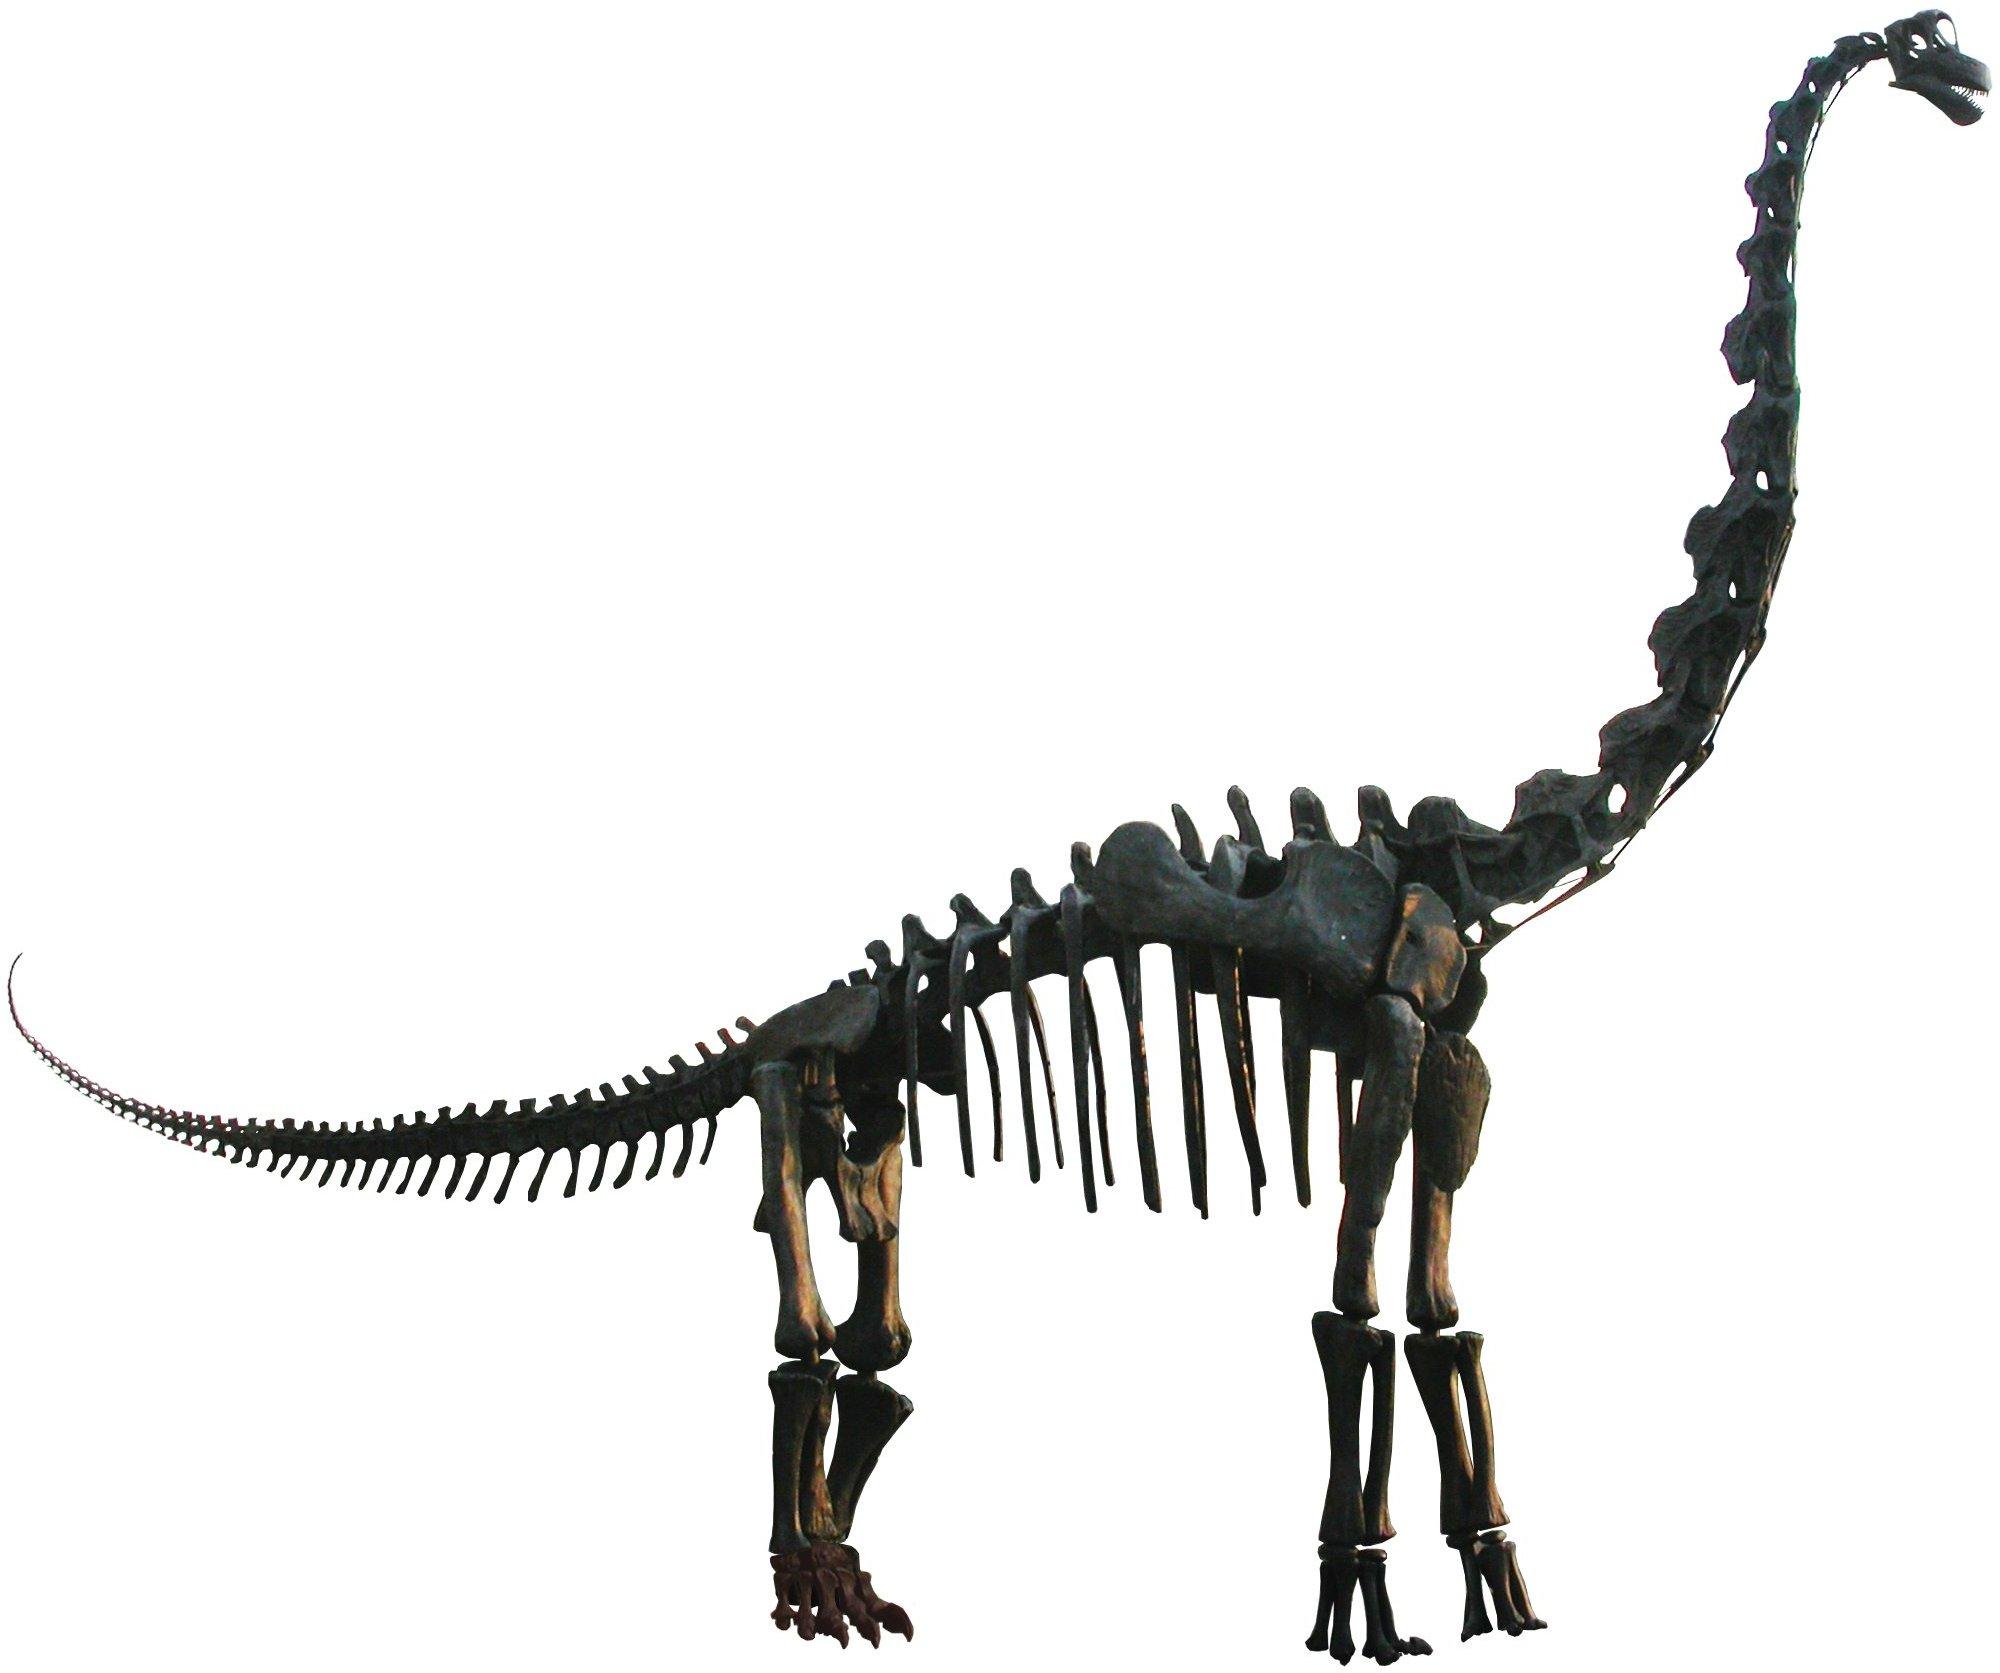 Dinosaur Bones - Brachiosaurs